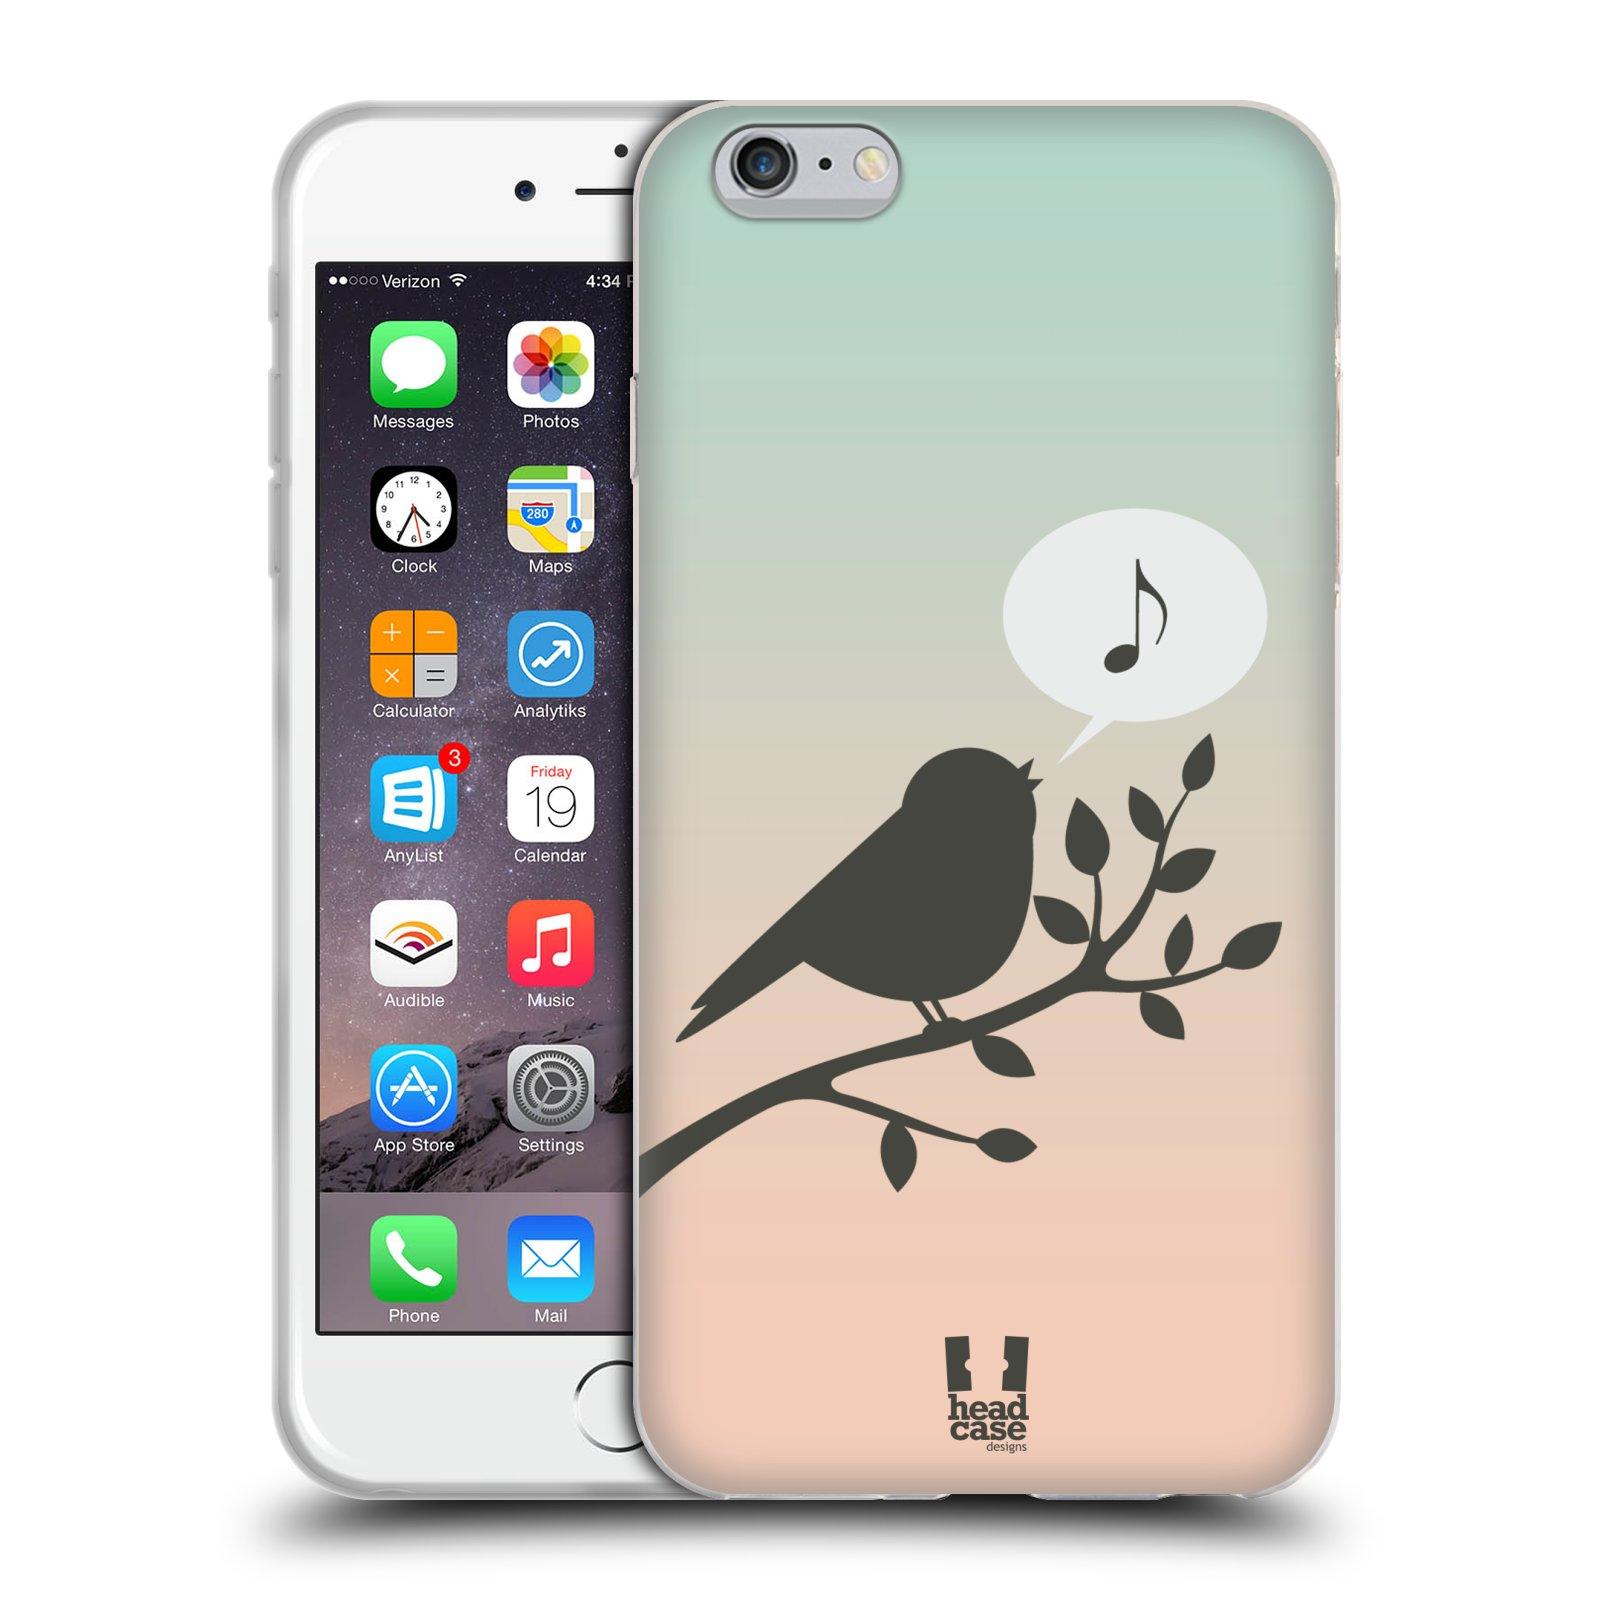 HEAD CASE silikonový obal na mobil Apple Iphone 6 PLUS/ 6S PLUS vzor Ptáček zpěváček noty píseň